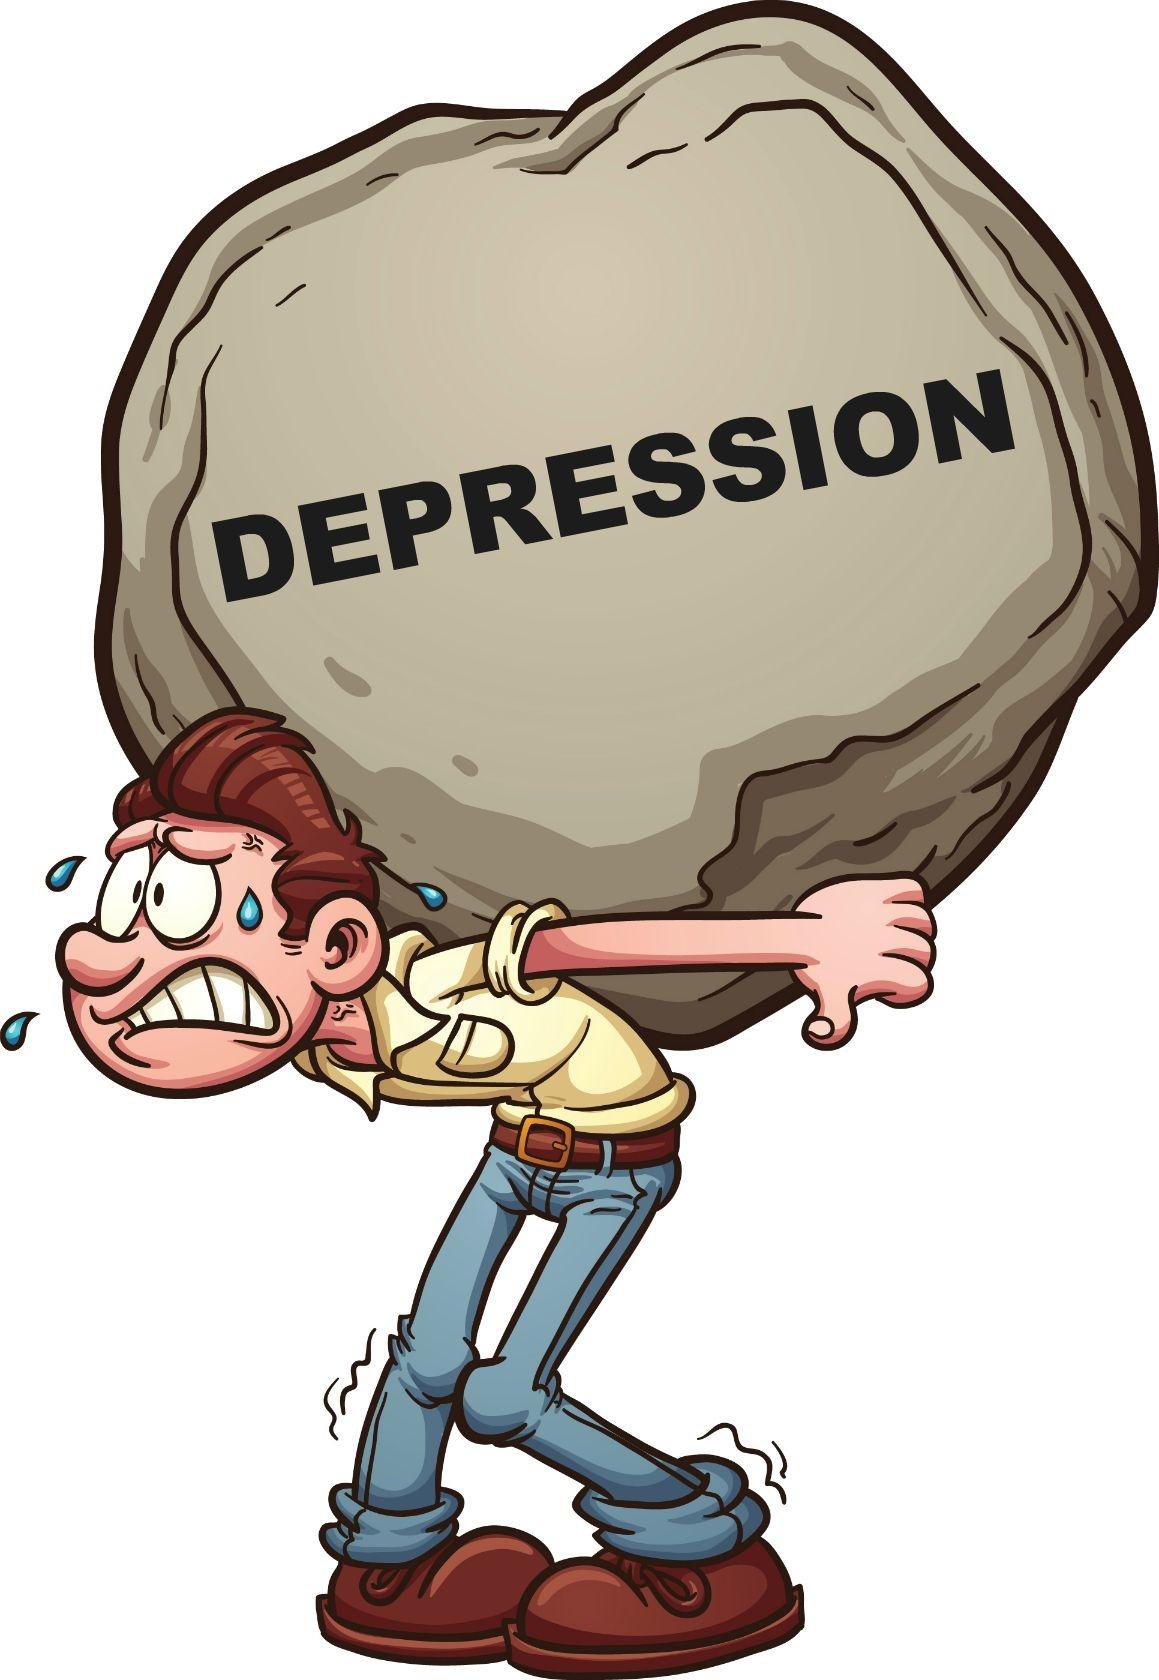 1159x1680 Best Of Depression Clipart Design